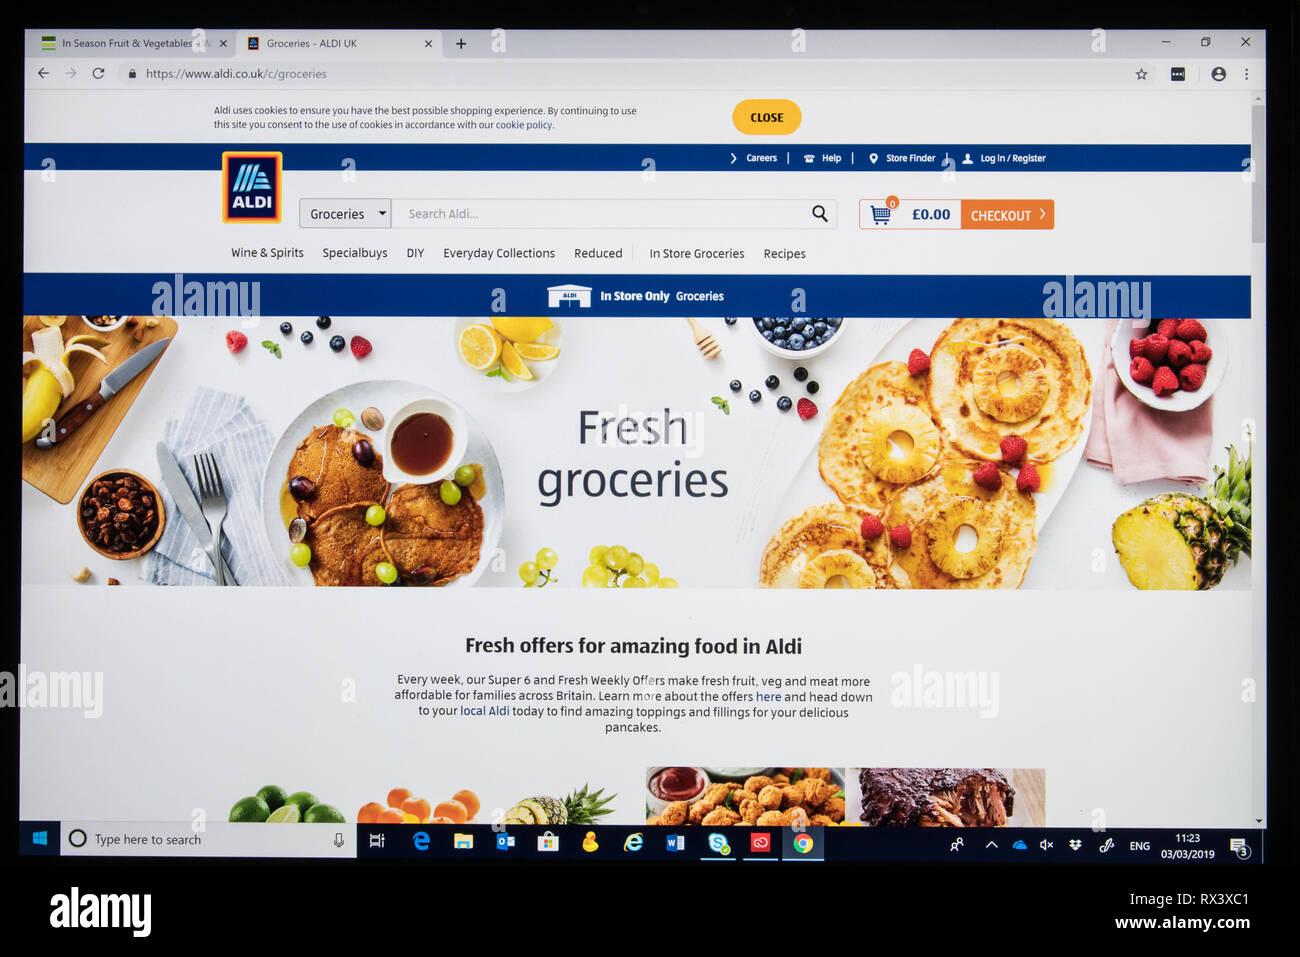 Aldi tienda online captura de pantalla muestra la página de comestibles frescos Imagen De Stock